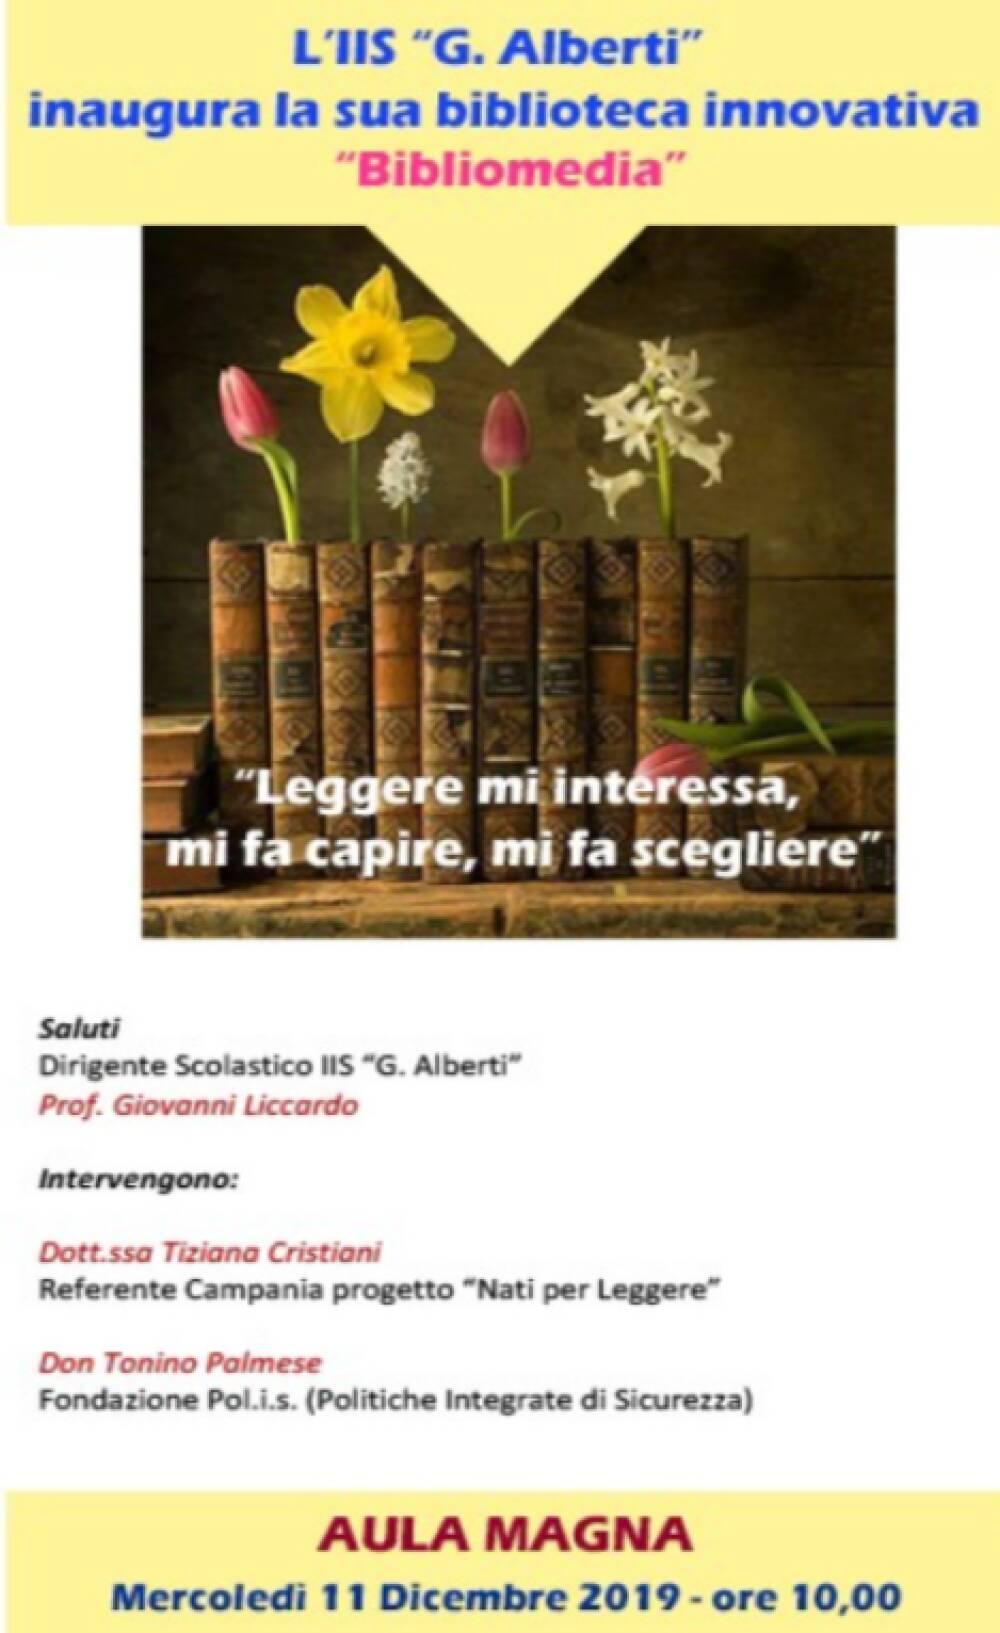 locandina bibliomedia